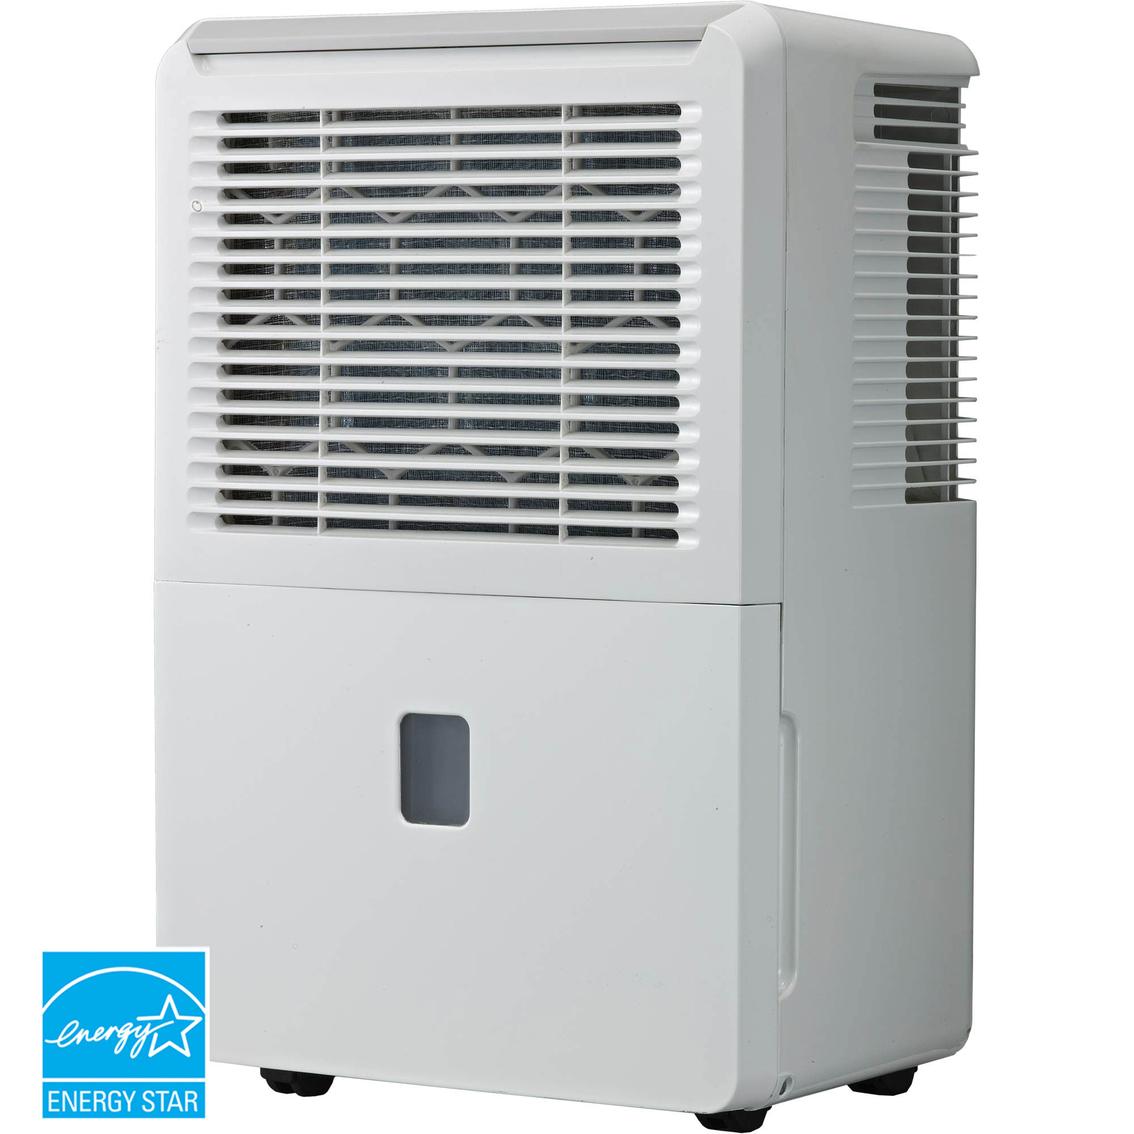 70 Pt. Dehumidifier With Water Pump Humidifiers & Dehumidifiers  #0093CB